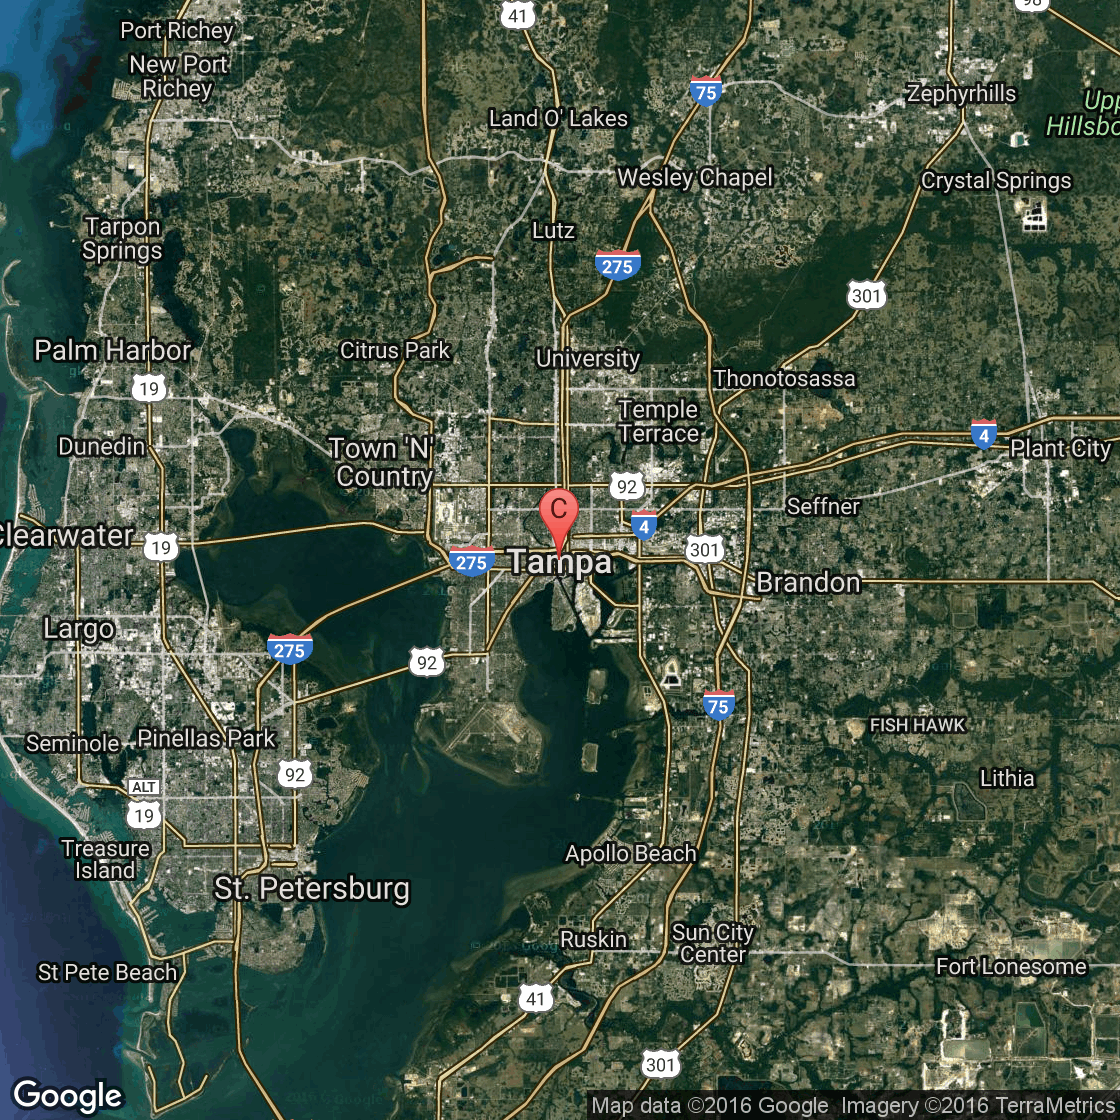 PetFriendly Beaches Near Tampa Florida USA Today - Map of florida cities near tampa